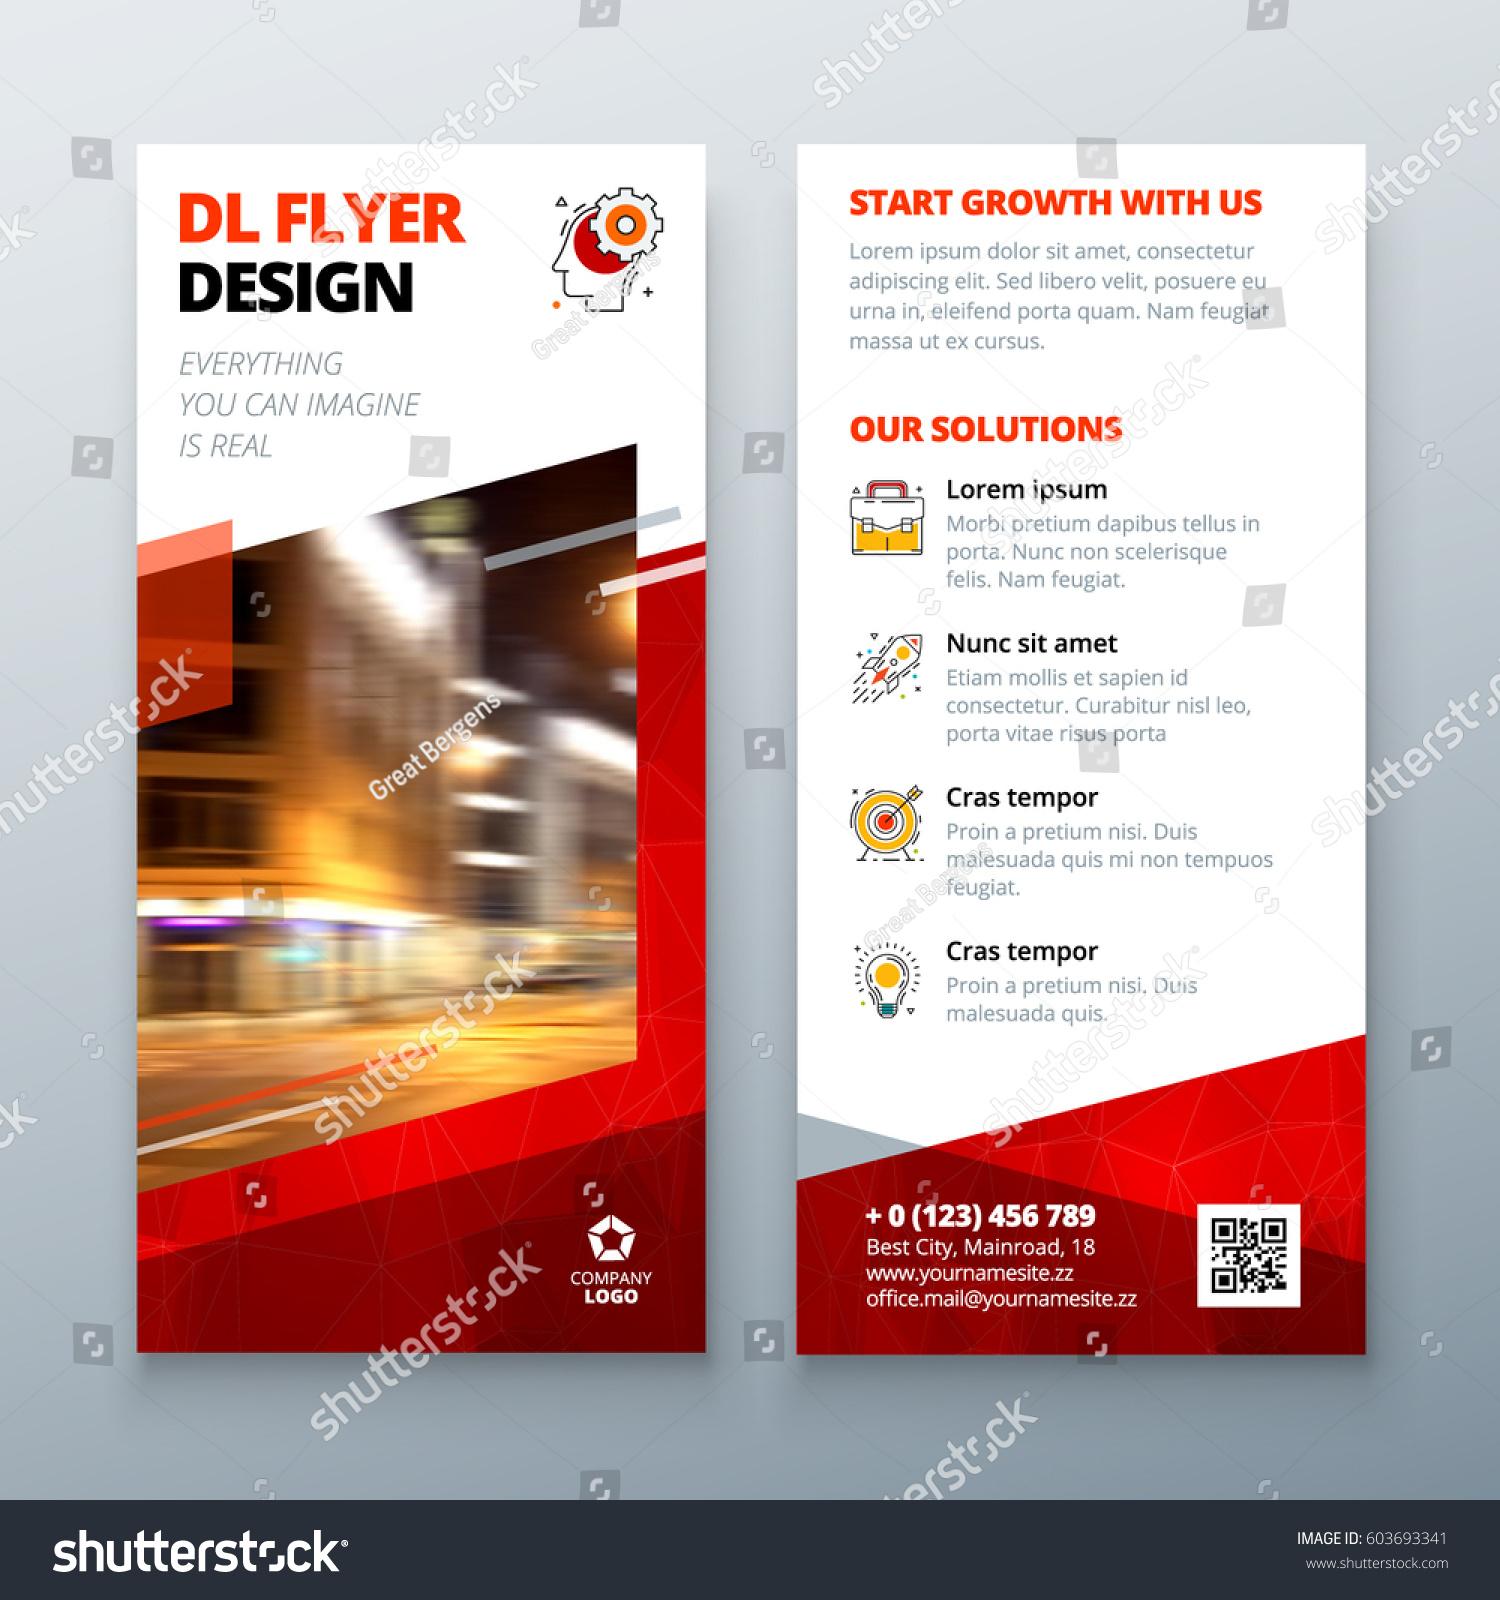 dl brochure template - dl flyer design layout dl corporate stock vector 603693341